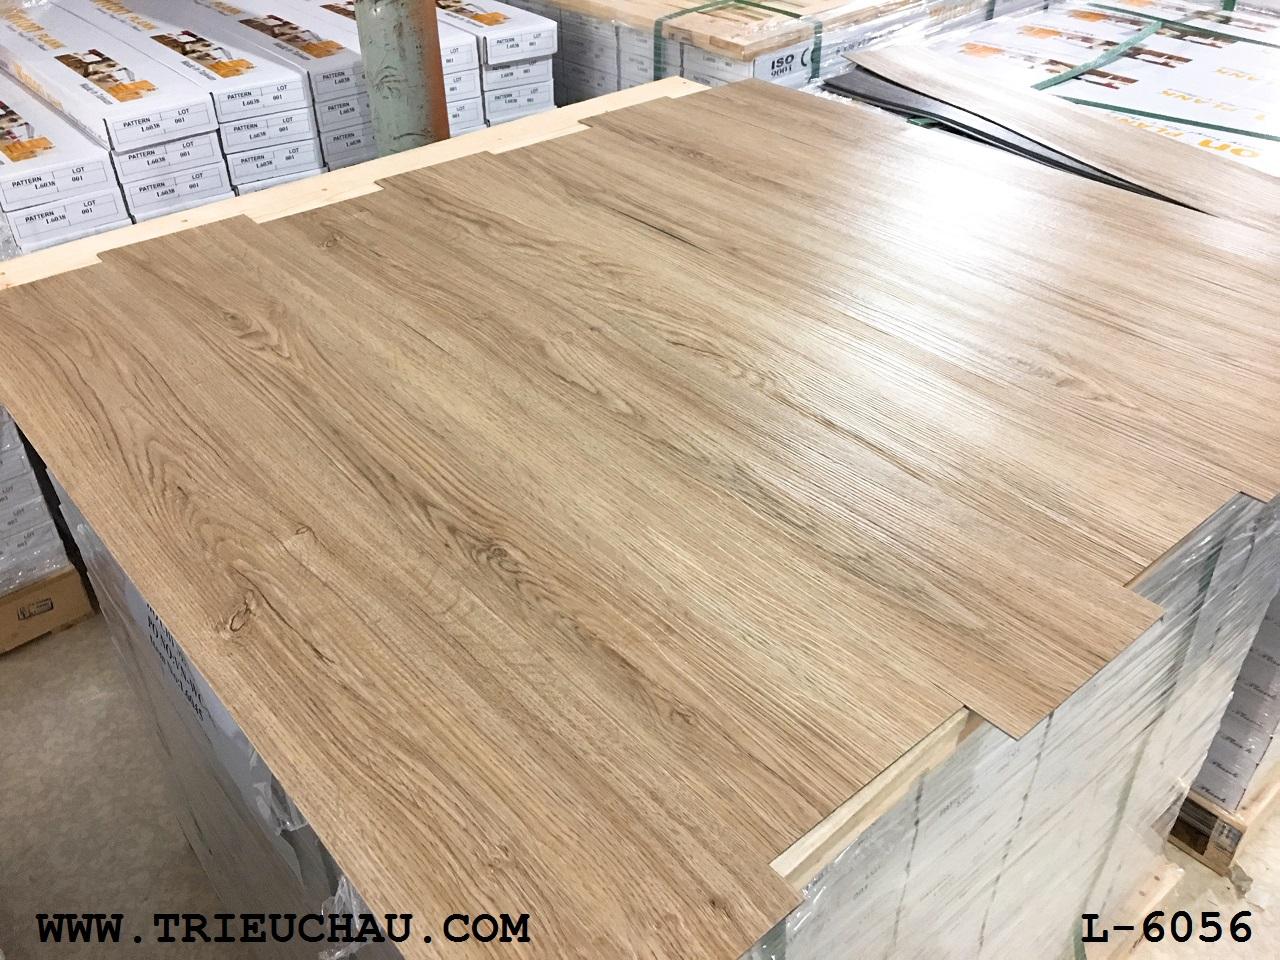 sàn nhựa giả gỗ wilton, sàn nhựa vân gỗ, sàn nhựa vinyl